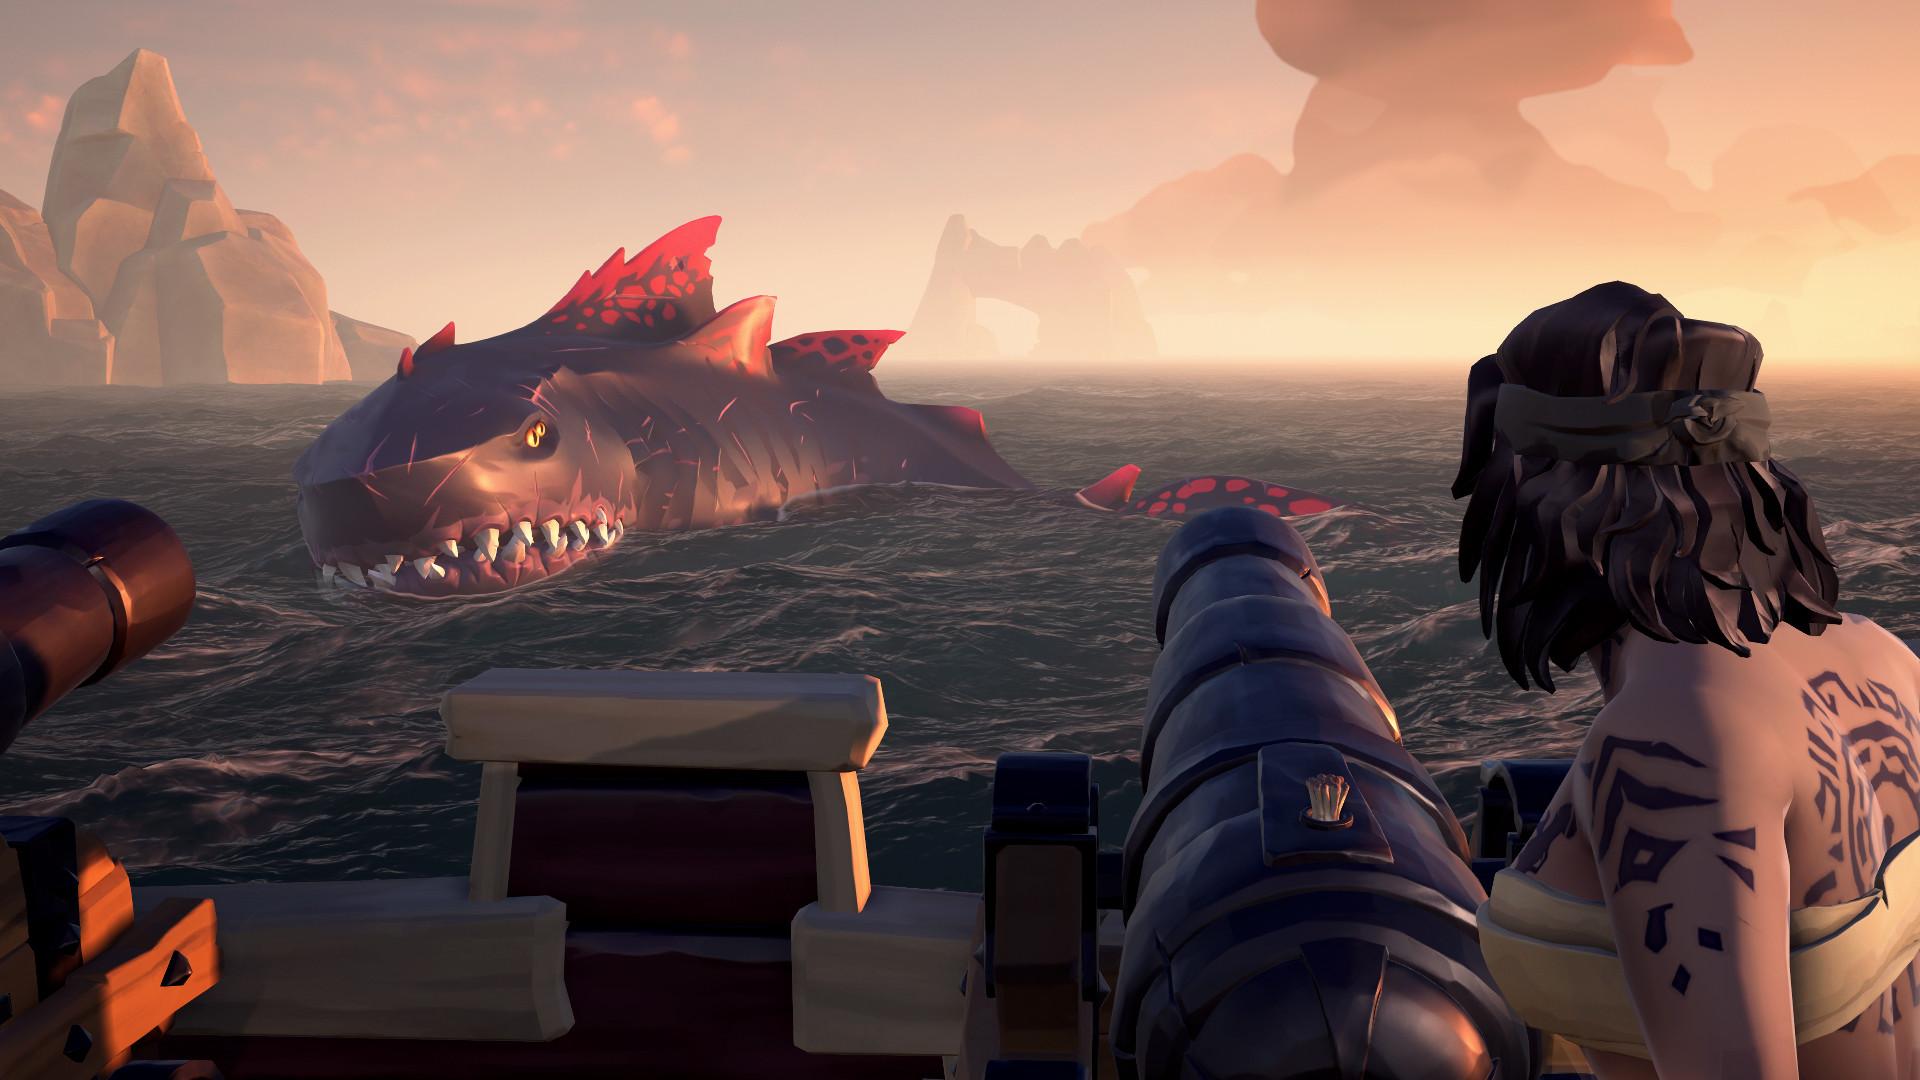 sea of thieves 2 - دانلود بازی آنلاین Sea of Thieves برای کامپیوتر